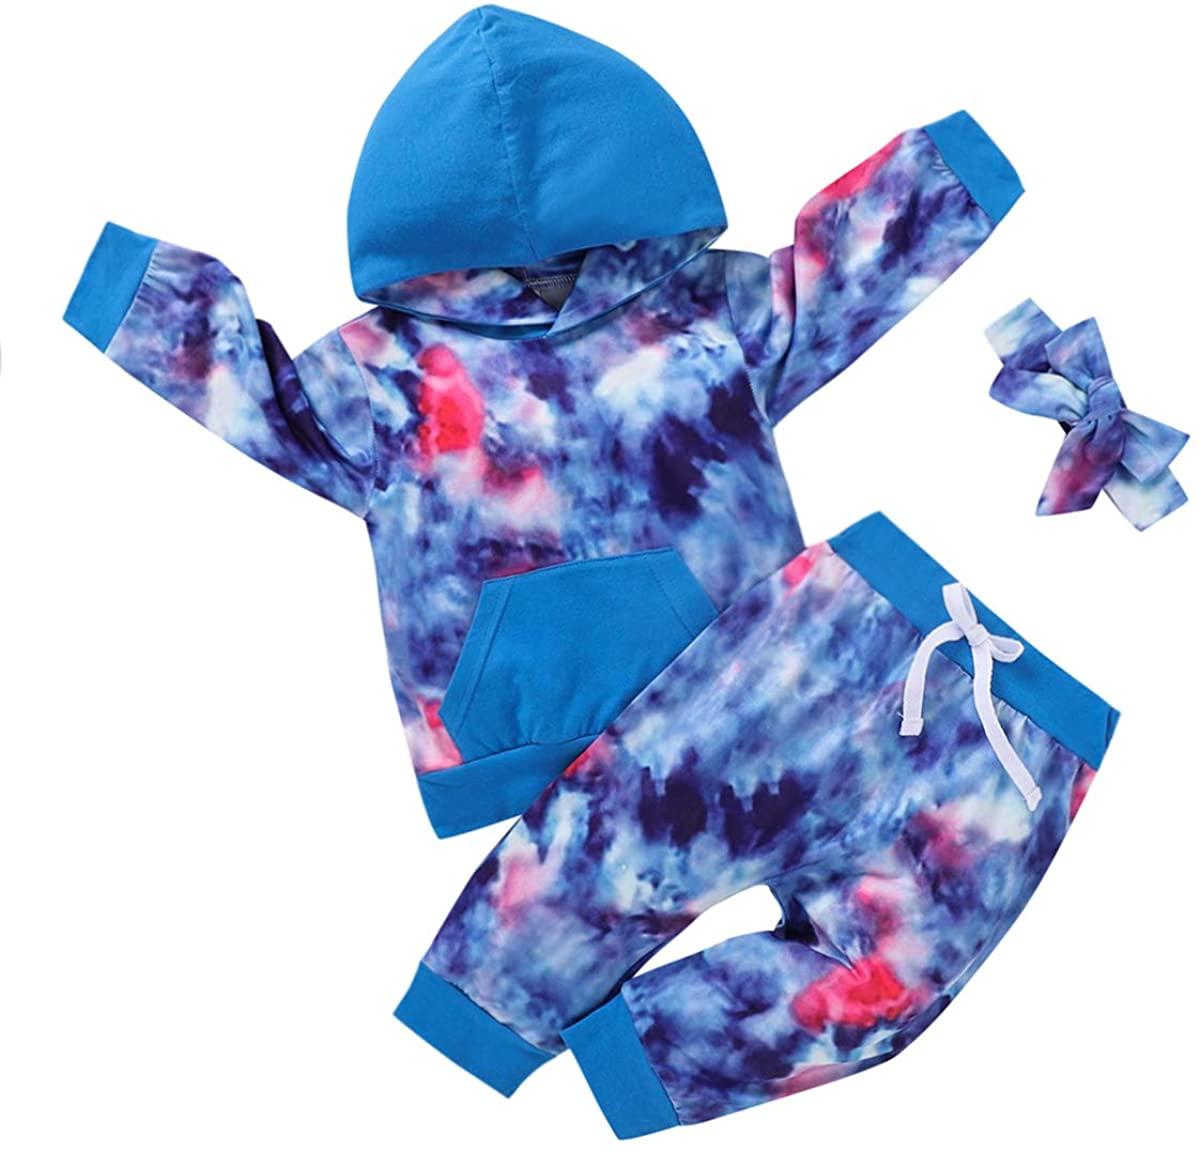 Newborn Baby Girl Clothes Toddler Hoddies Outfits Long Sleeve Sweatshirt Tops Infant Babies Pants Set